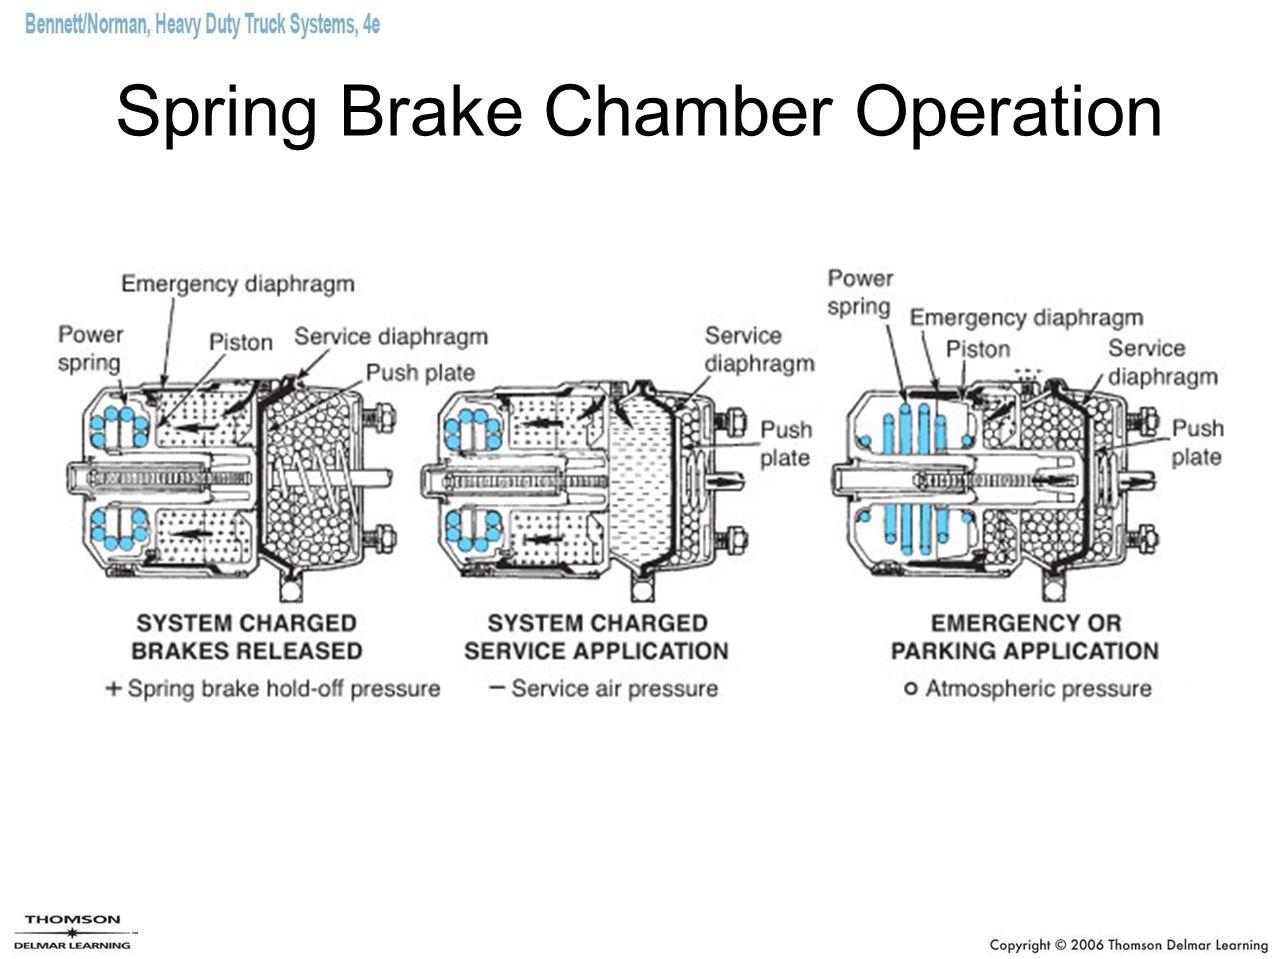 Spring Brake Chamber Operation